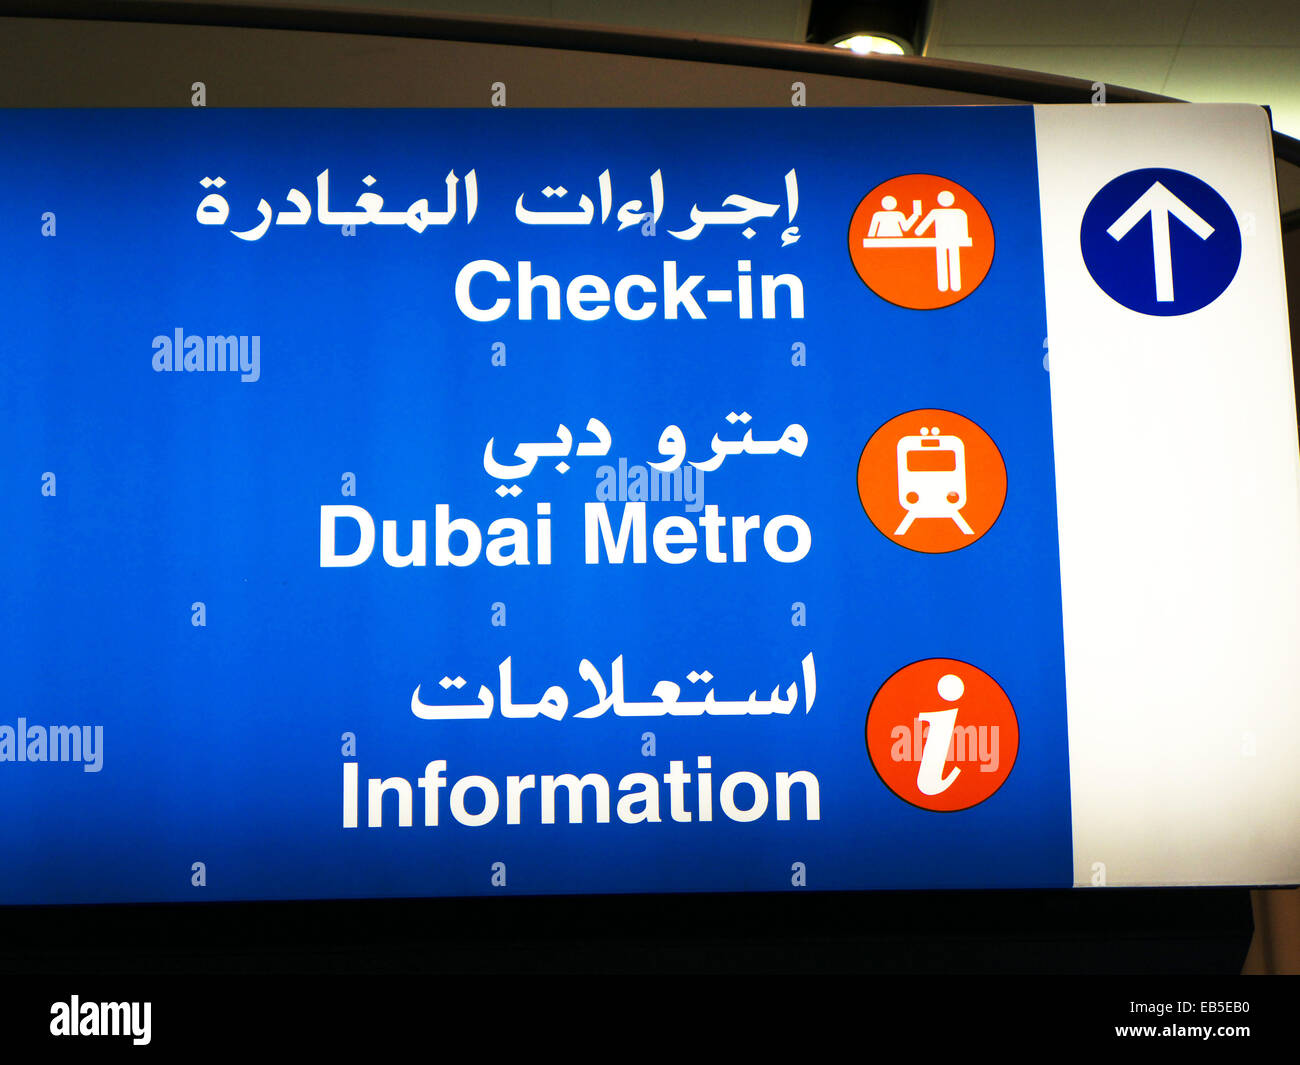 Emirati Arabi Uniti Dubai International Airport arrivo partenza i segni e le indicazioni Immagini Stock